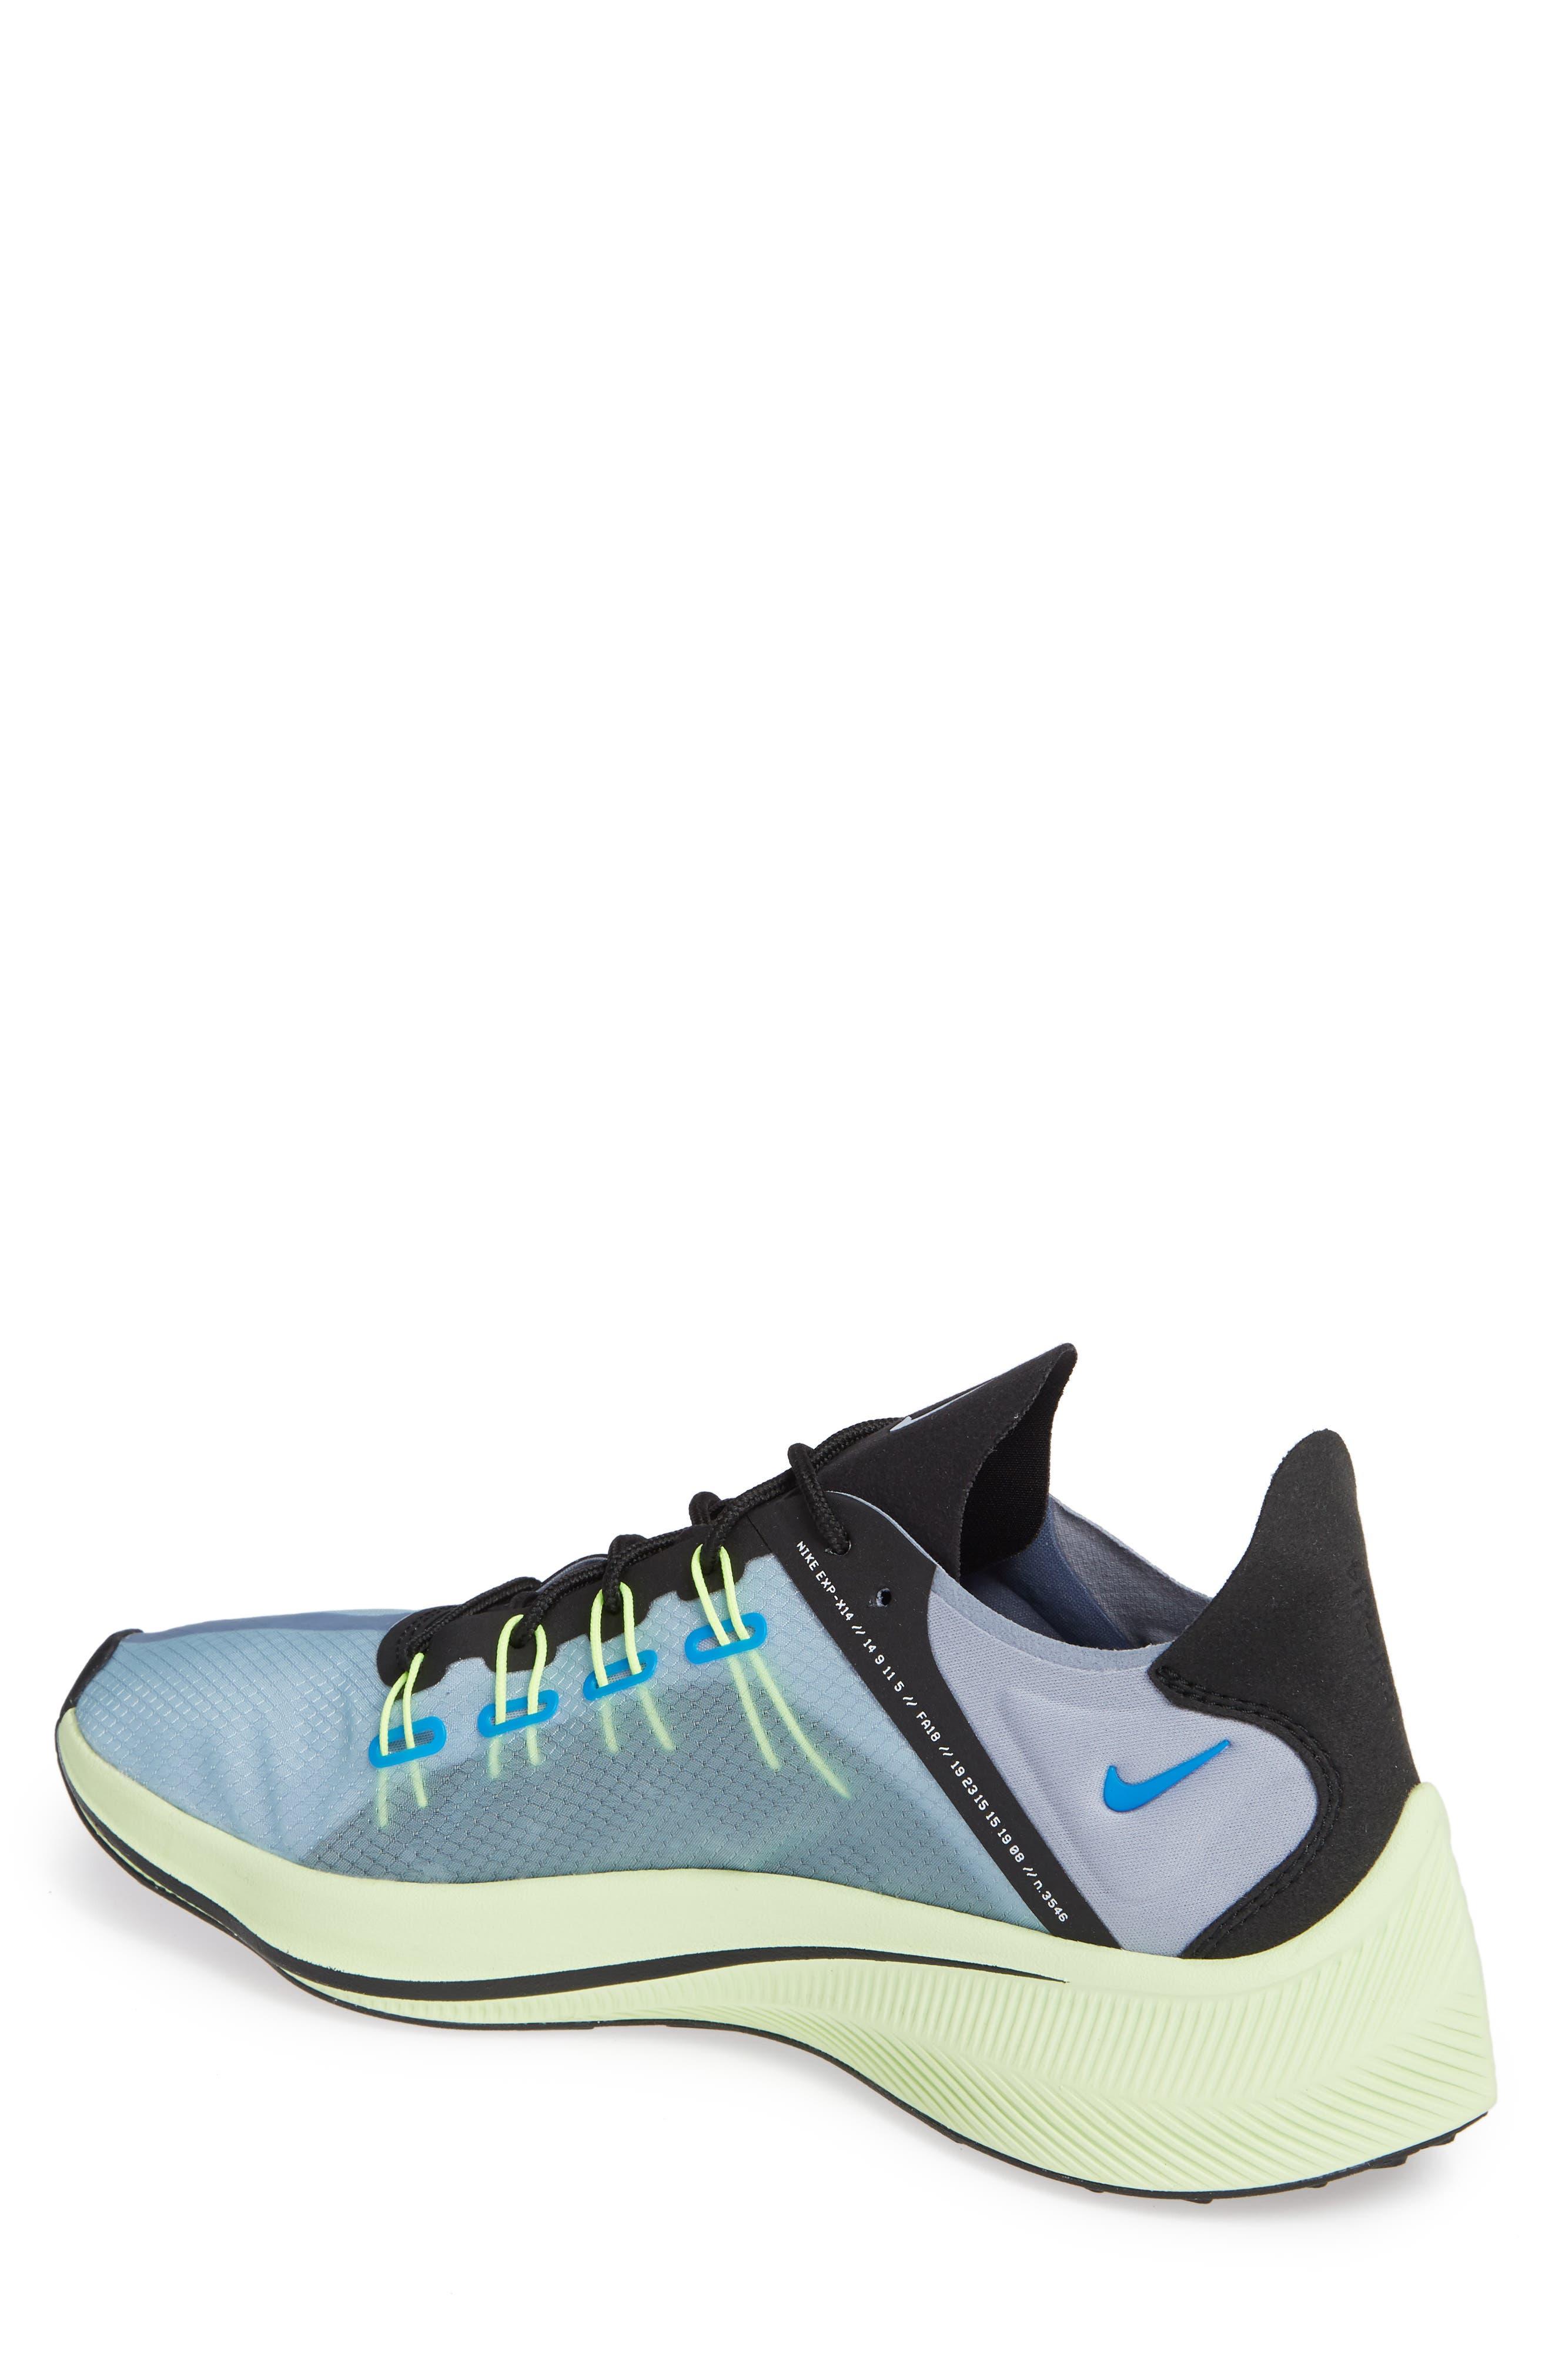 EXP-X14 Running Shoe,                             Alternate thumbnail 2, color,                             PHOTO BLUE/ GLACIER GREY